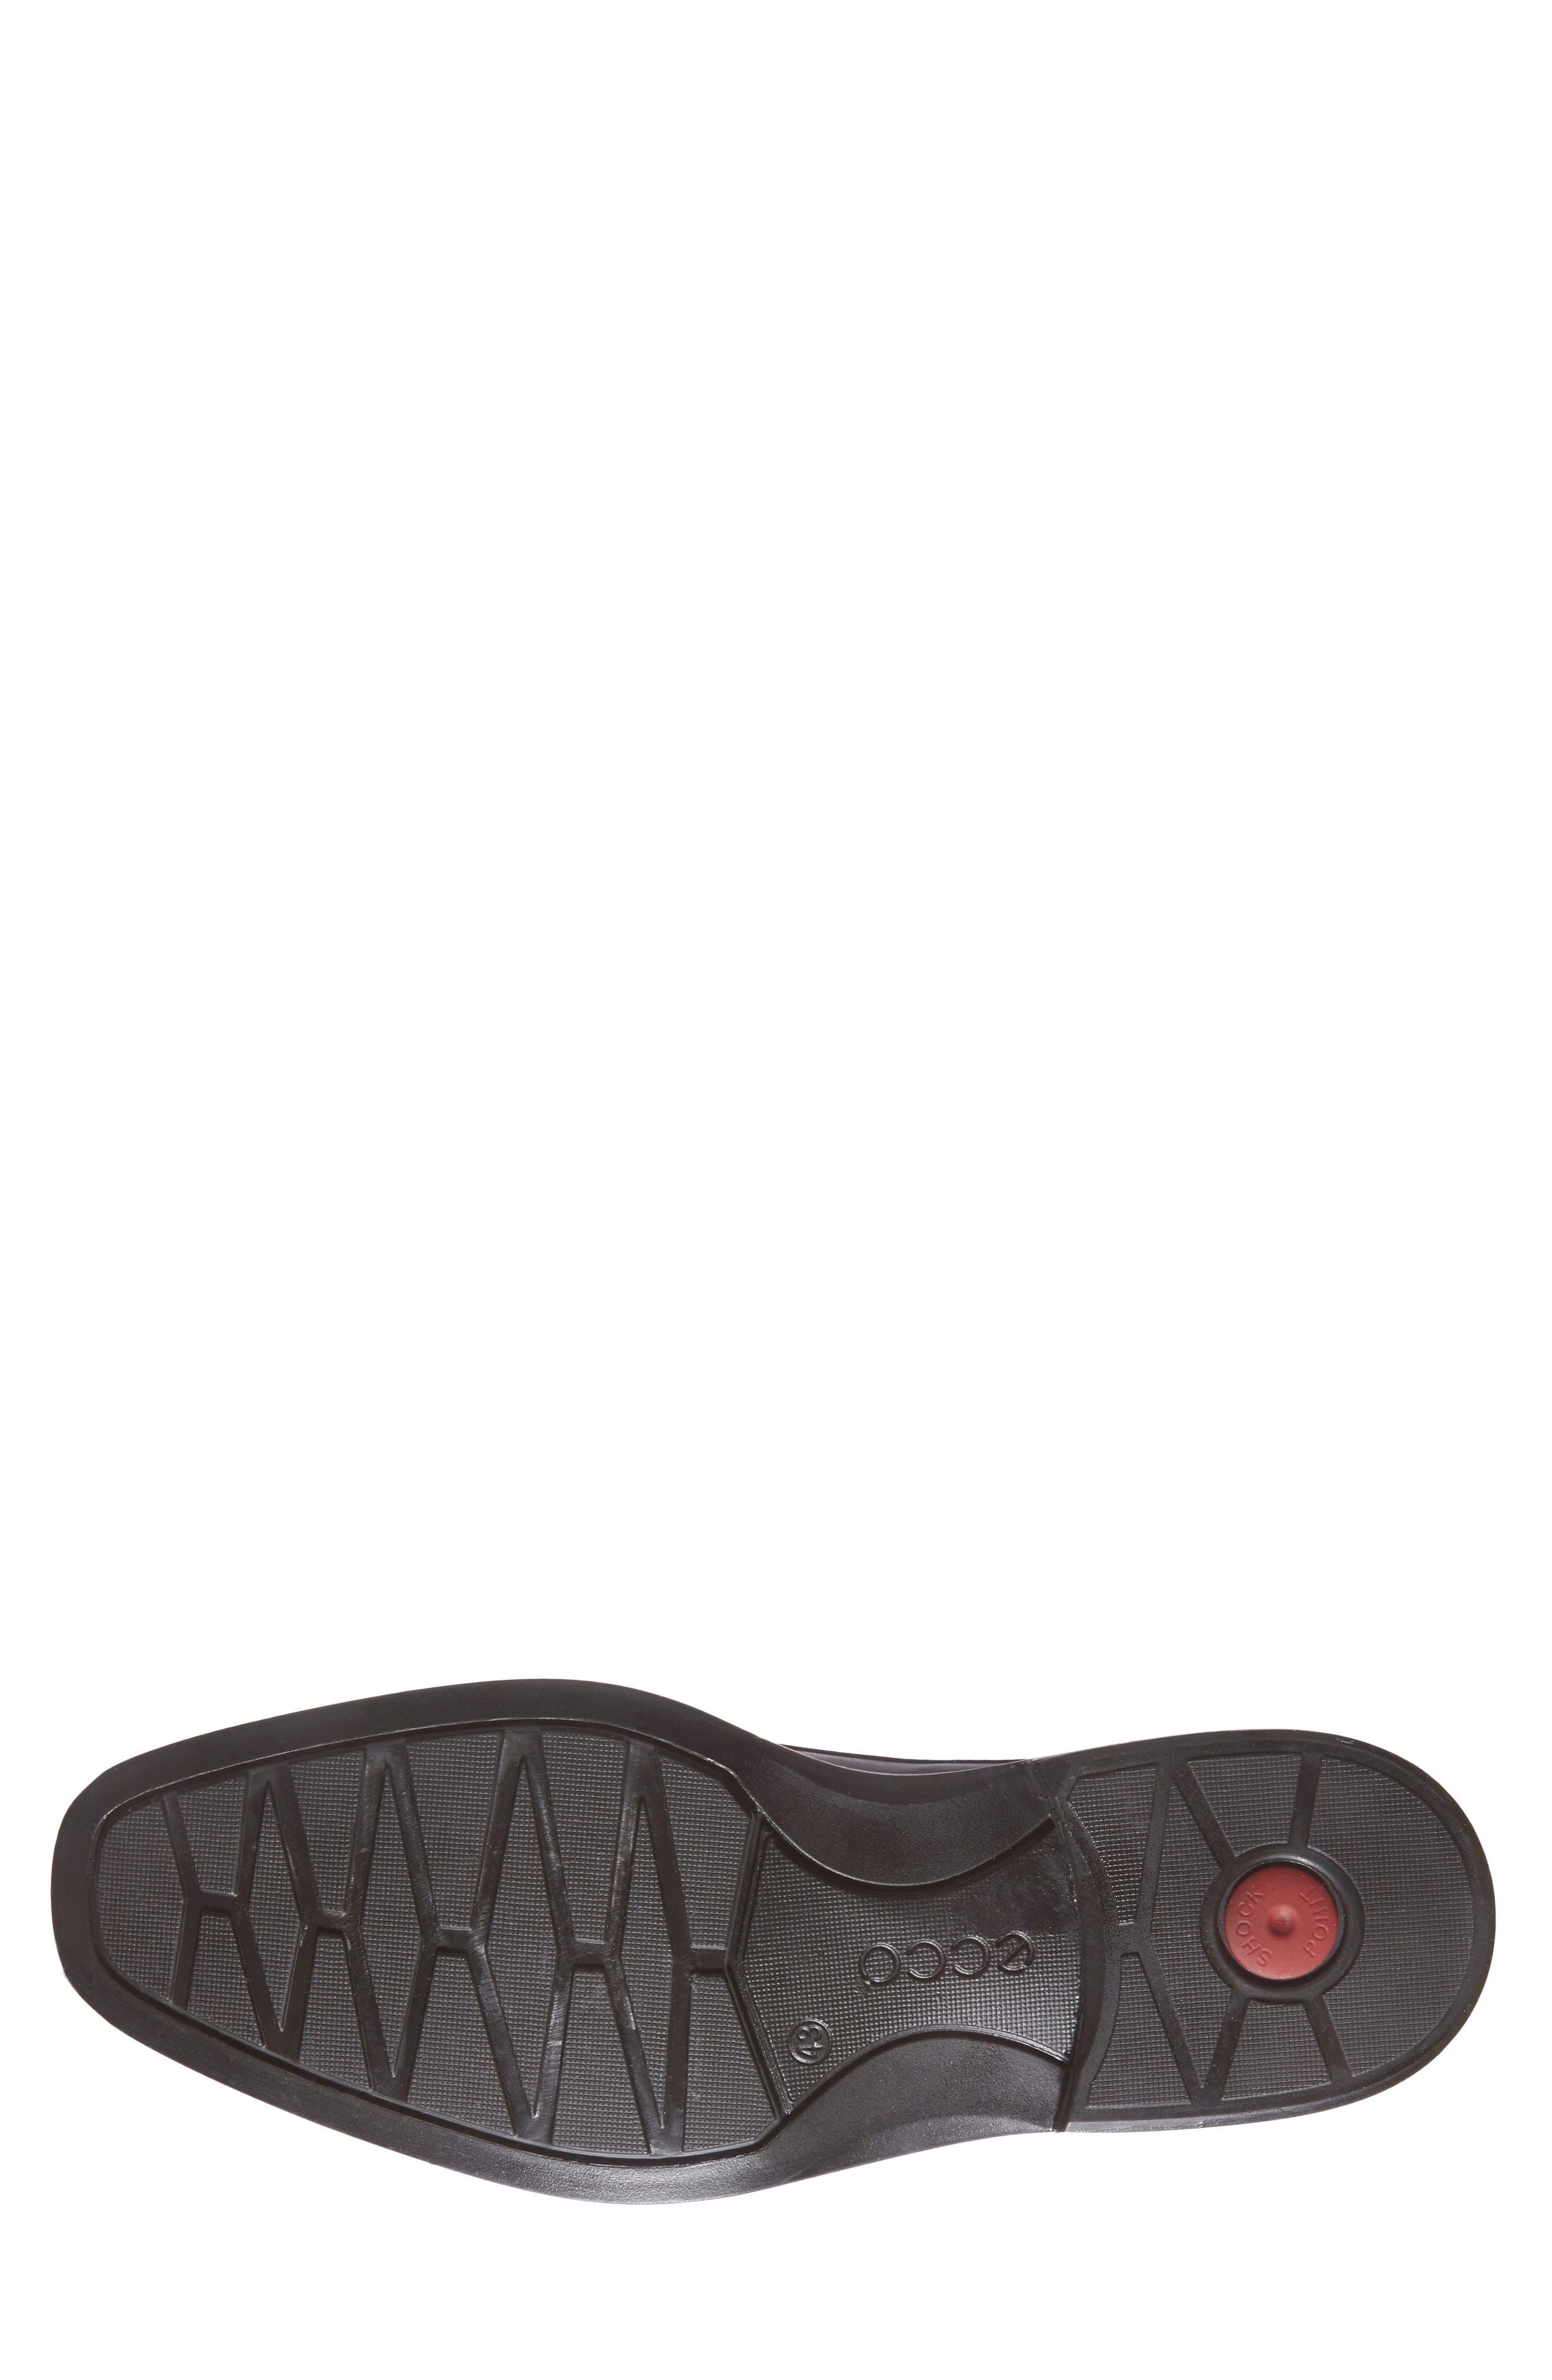 'Windsor' Slip-On,                             Alternate thumbnail 4, color,                             Black/Black Leather